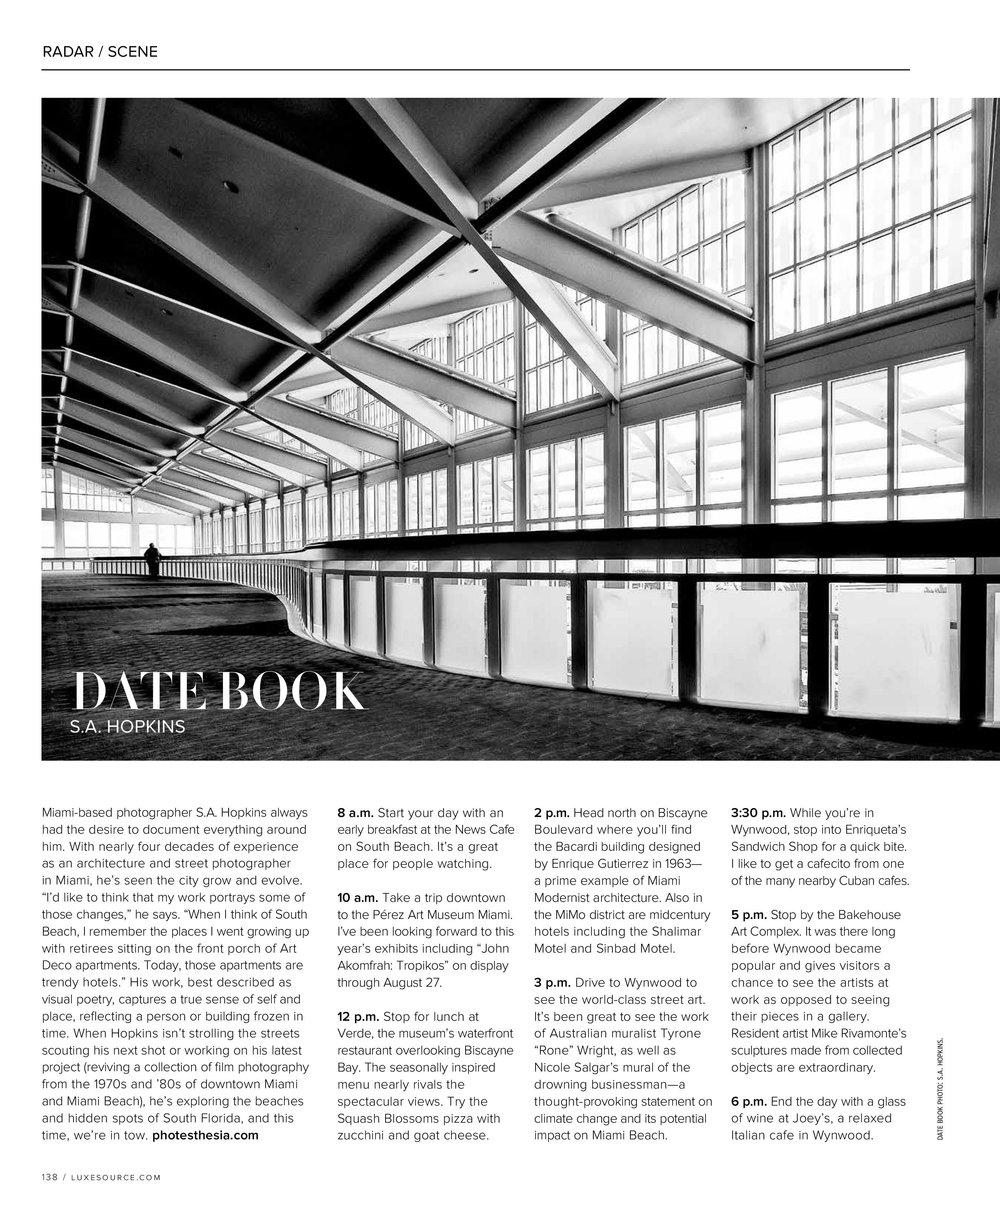 Luxe Interiors + Design Magazine - Photo - Orlando Convention CenterInterview - May / June 2017 Issue